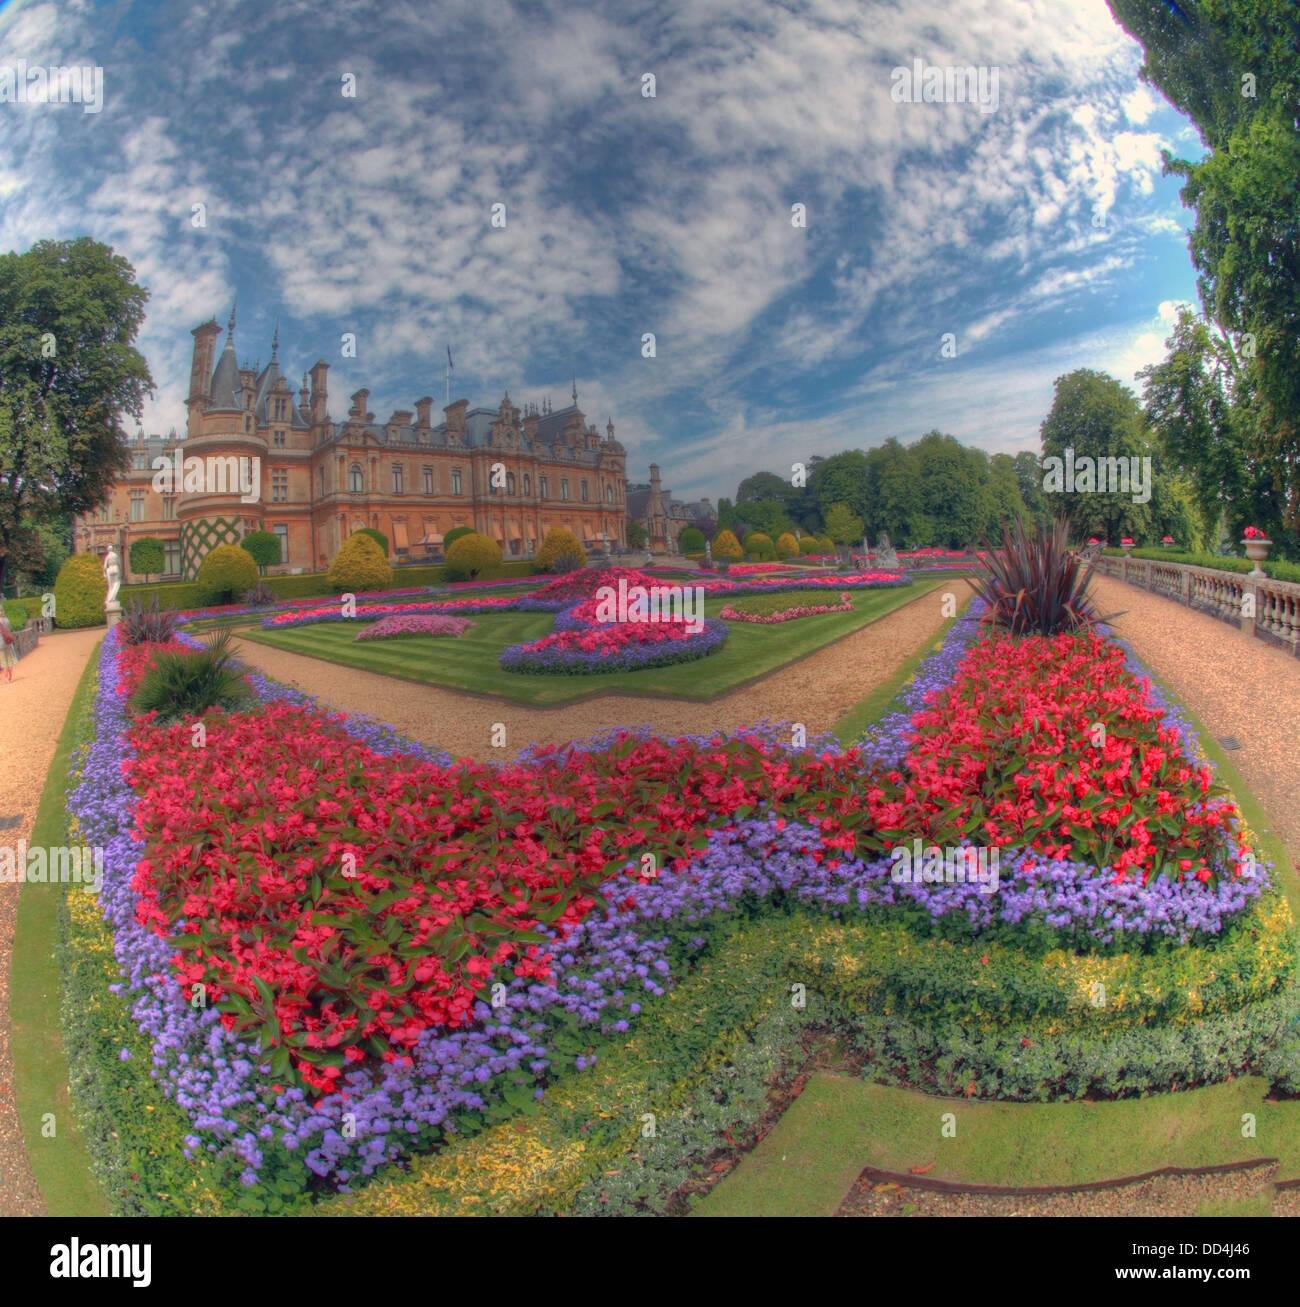 Panorama from Waddesdon Manor, Buckinghamshire, England - Stock Image